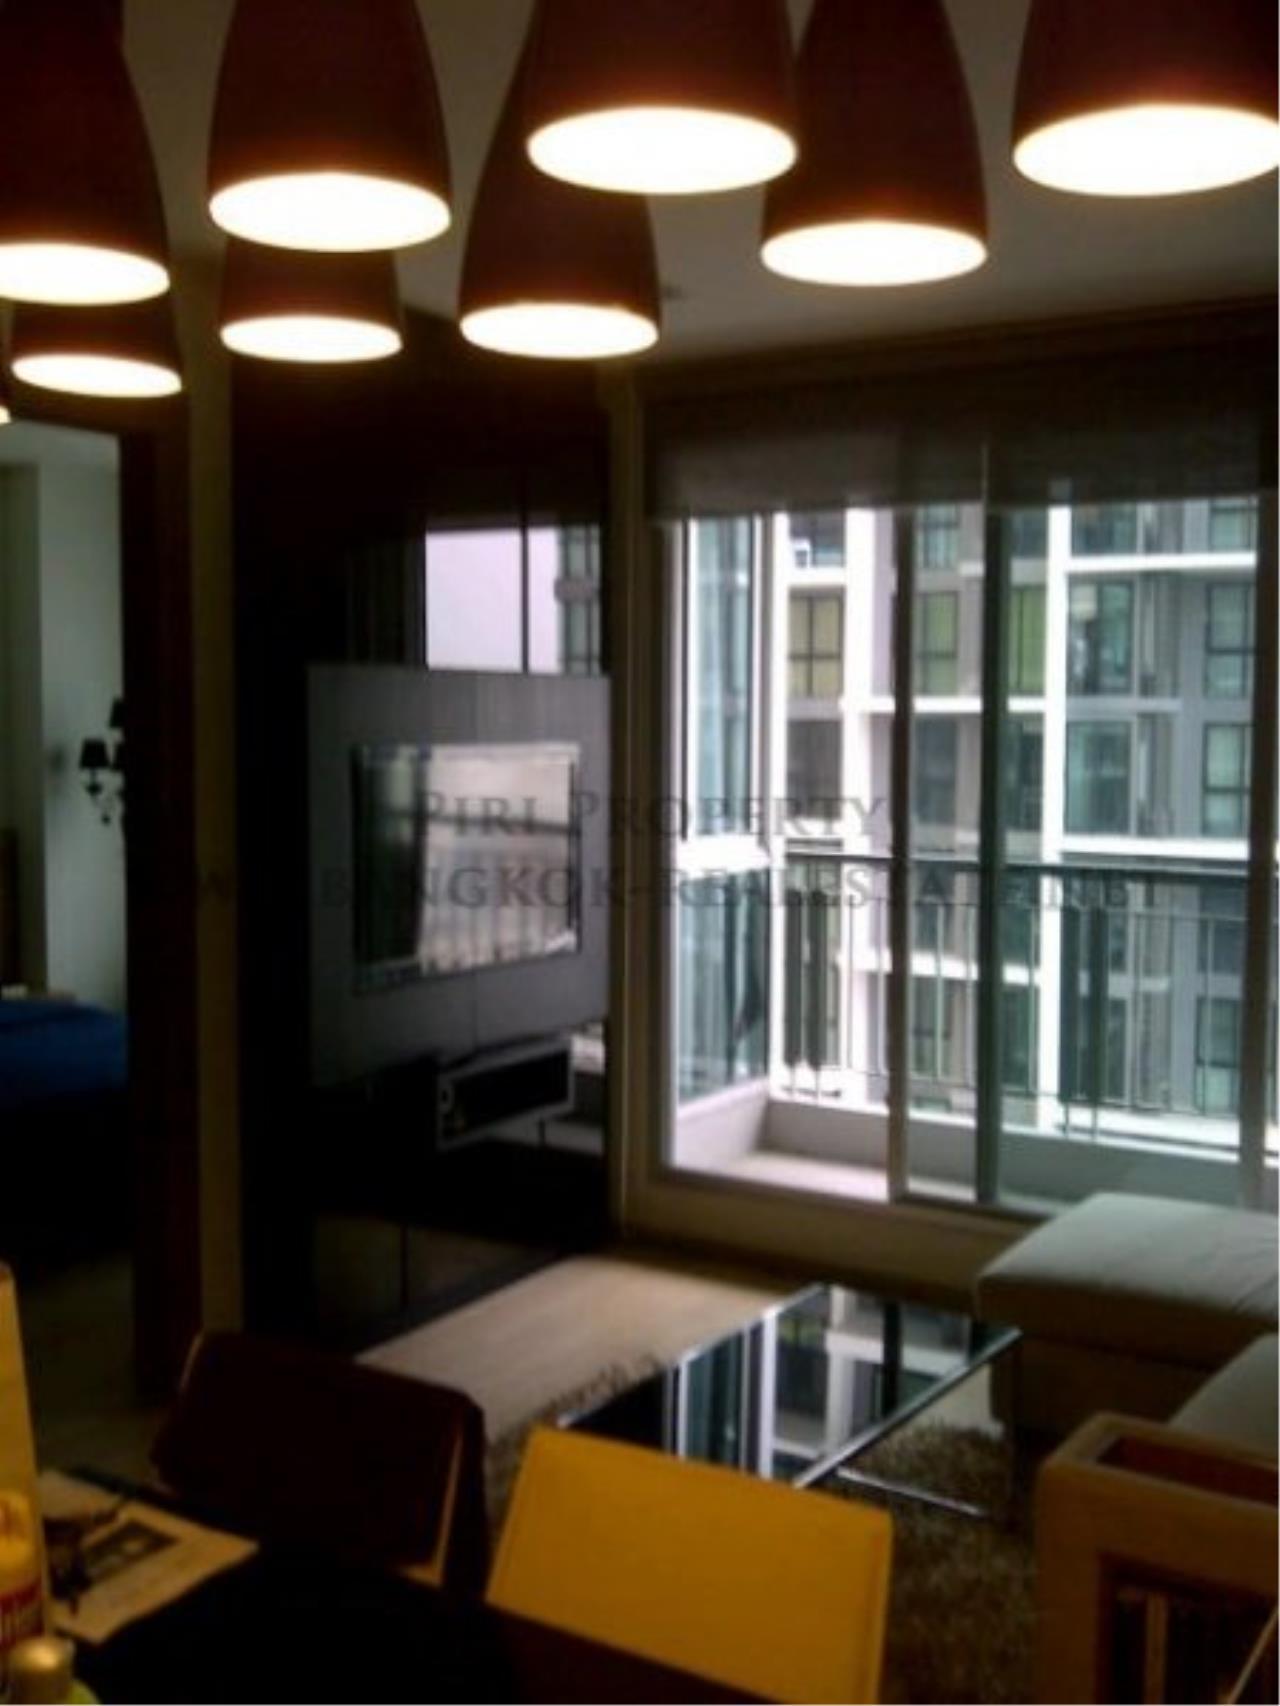 Piri Property Agency's Rhythm Ratchada - Huay Kwang - modern 1 Bedroom Condo for Rent 6